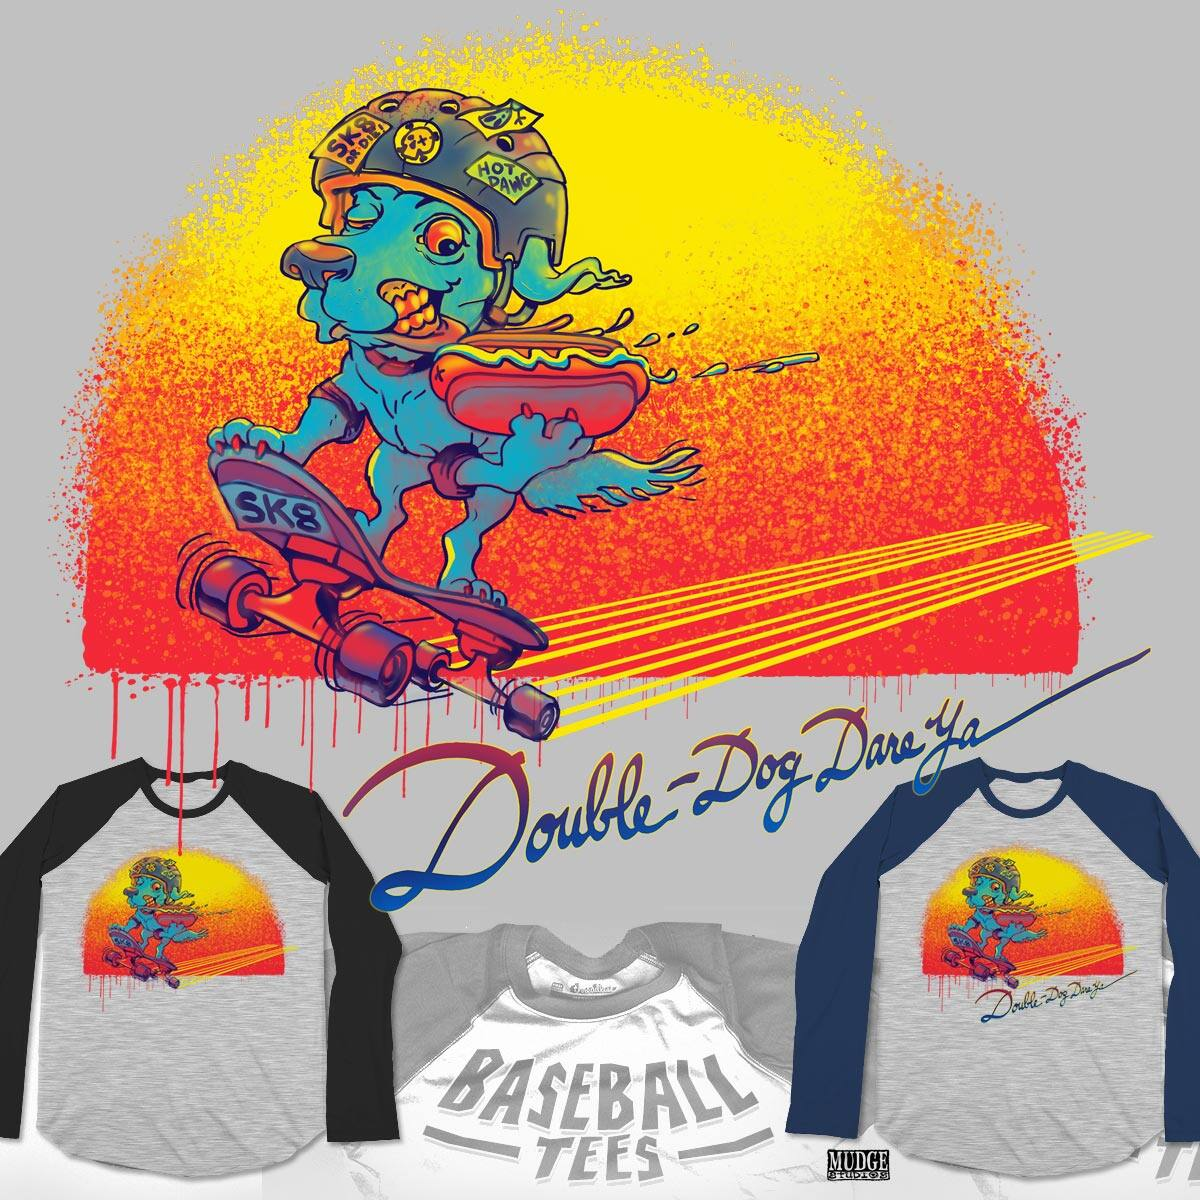 Double Dog Dare Ya by MudgeStudios on Threadless